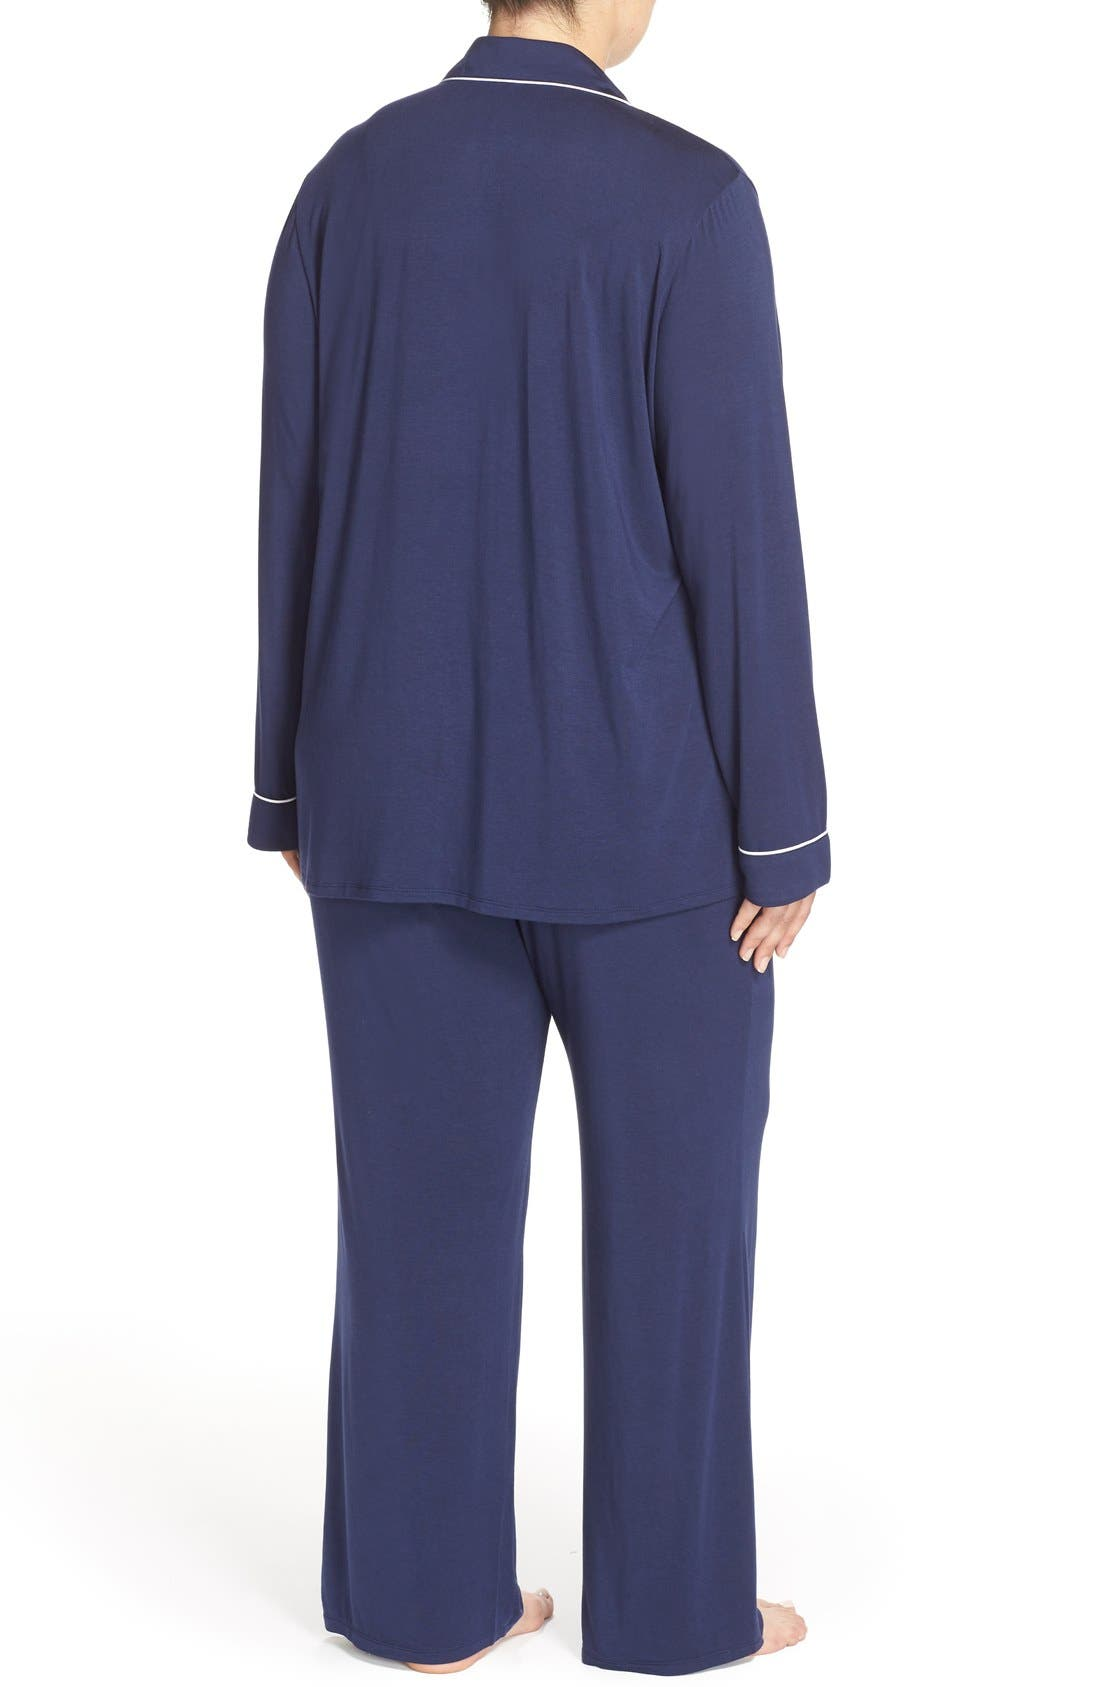 'Moonlight' Pajamas,                             Alternate thumbnail 2, color,                             Navy Peacoat